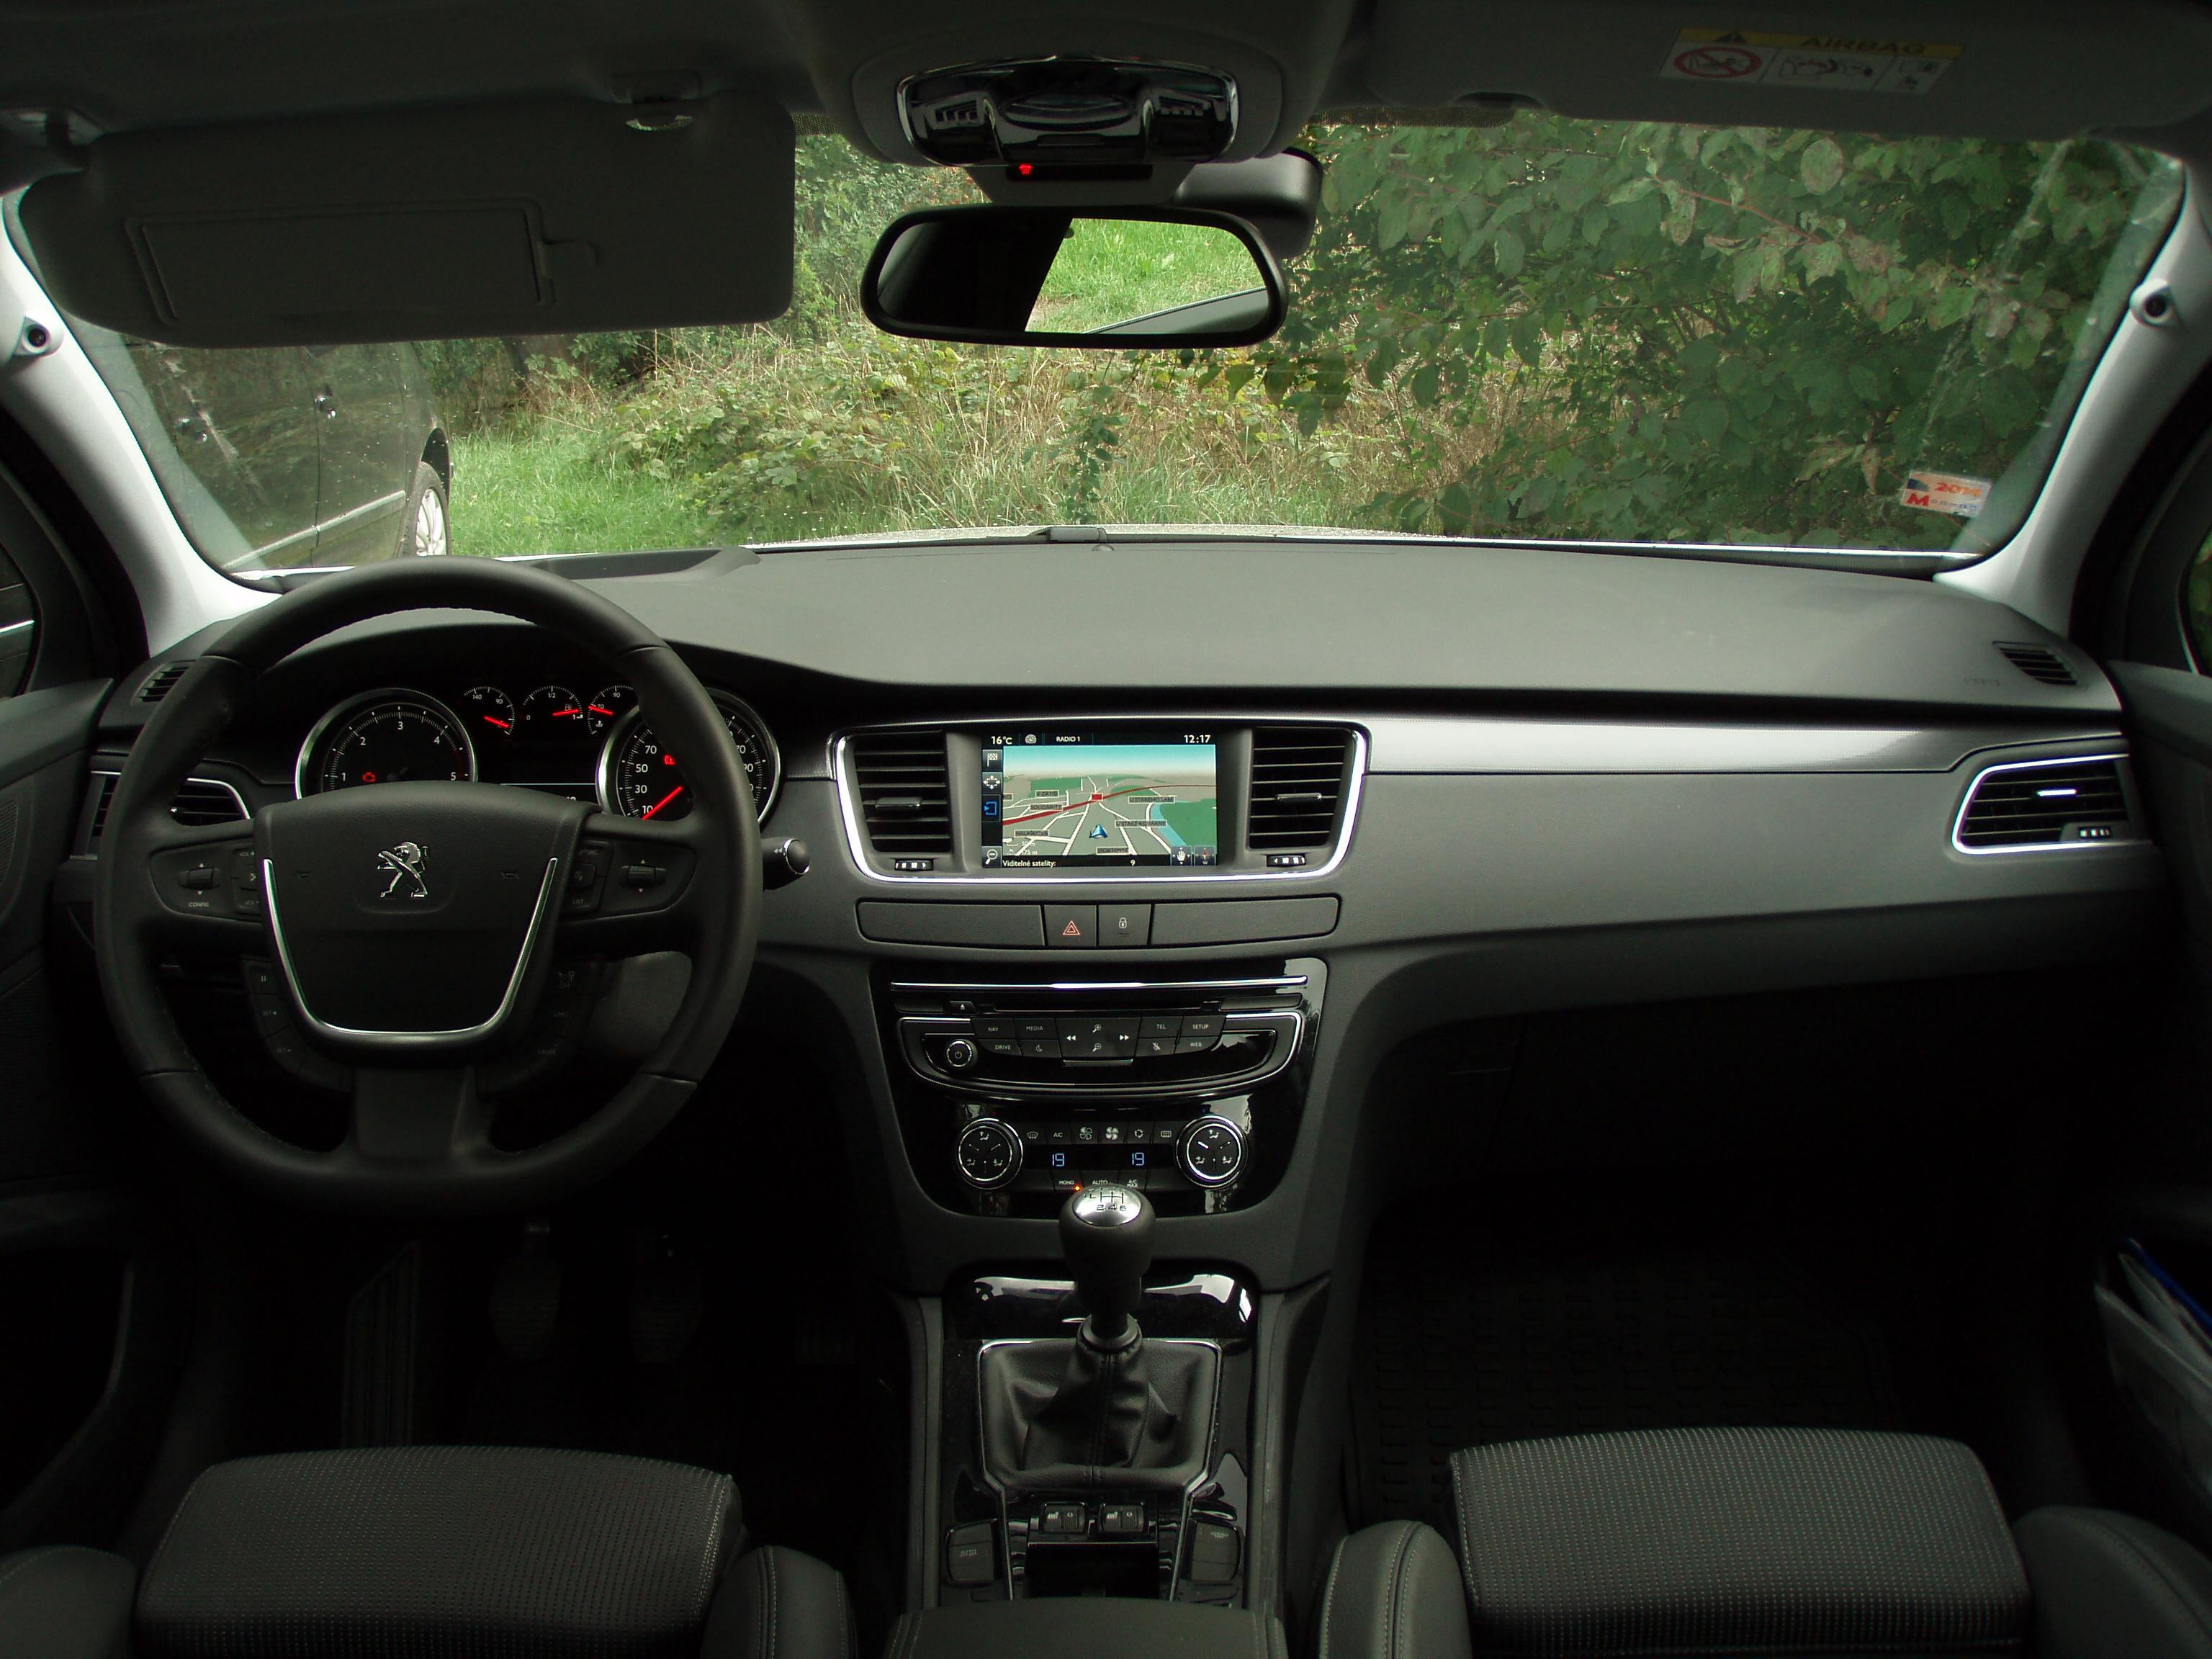 File peugeot 508 facelift interior 5 jpg wikimedia commons - Interior peugeot 508 ...